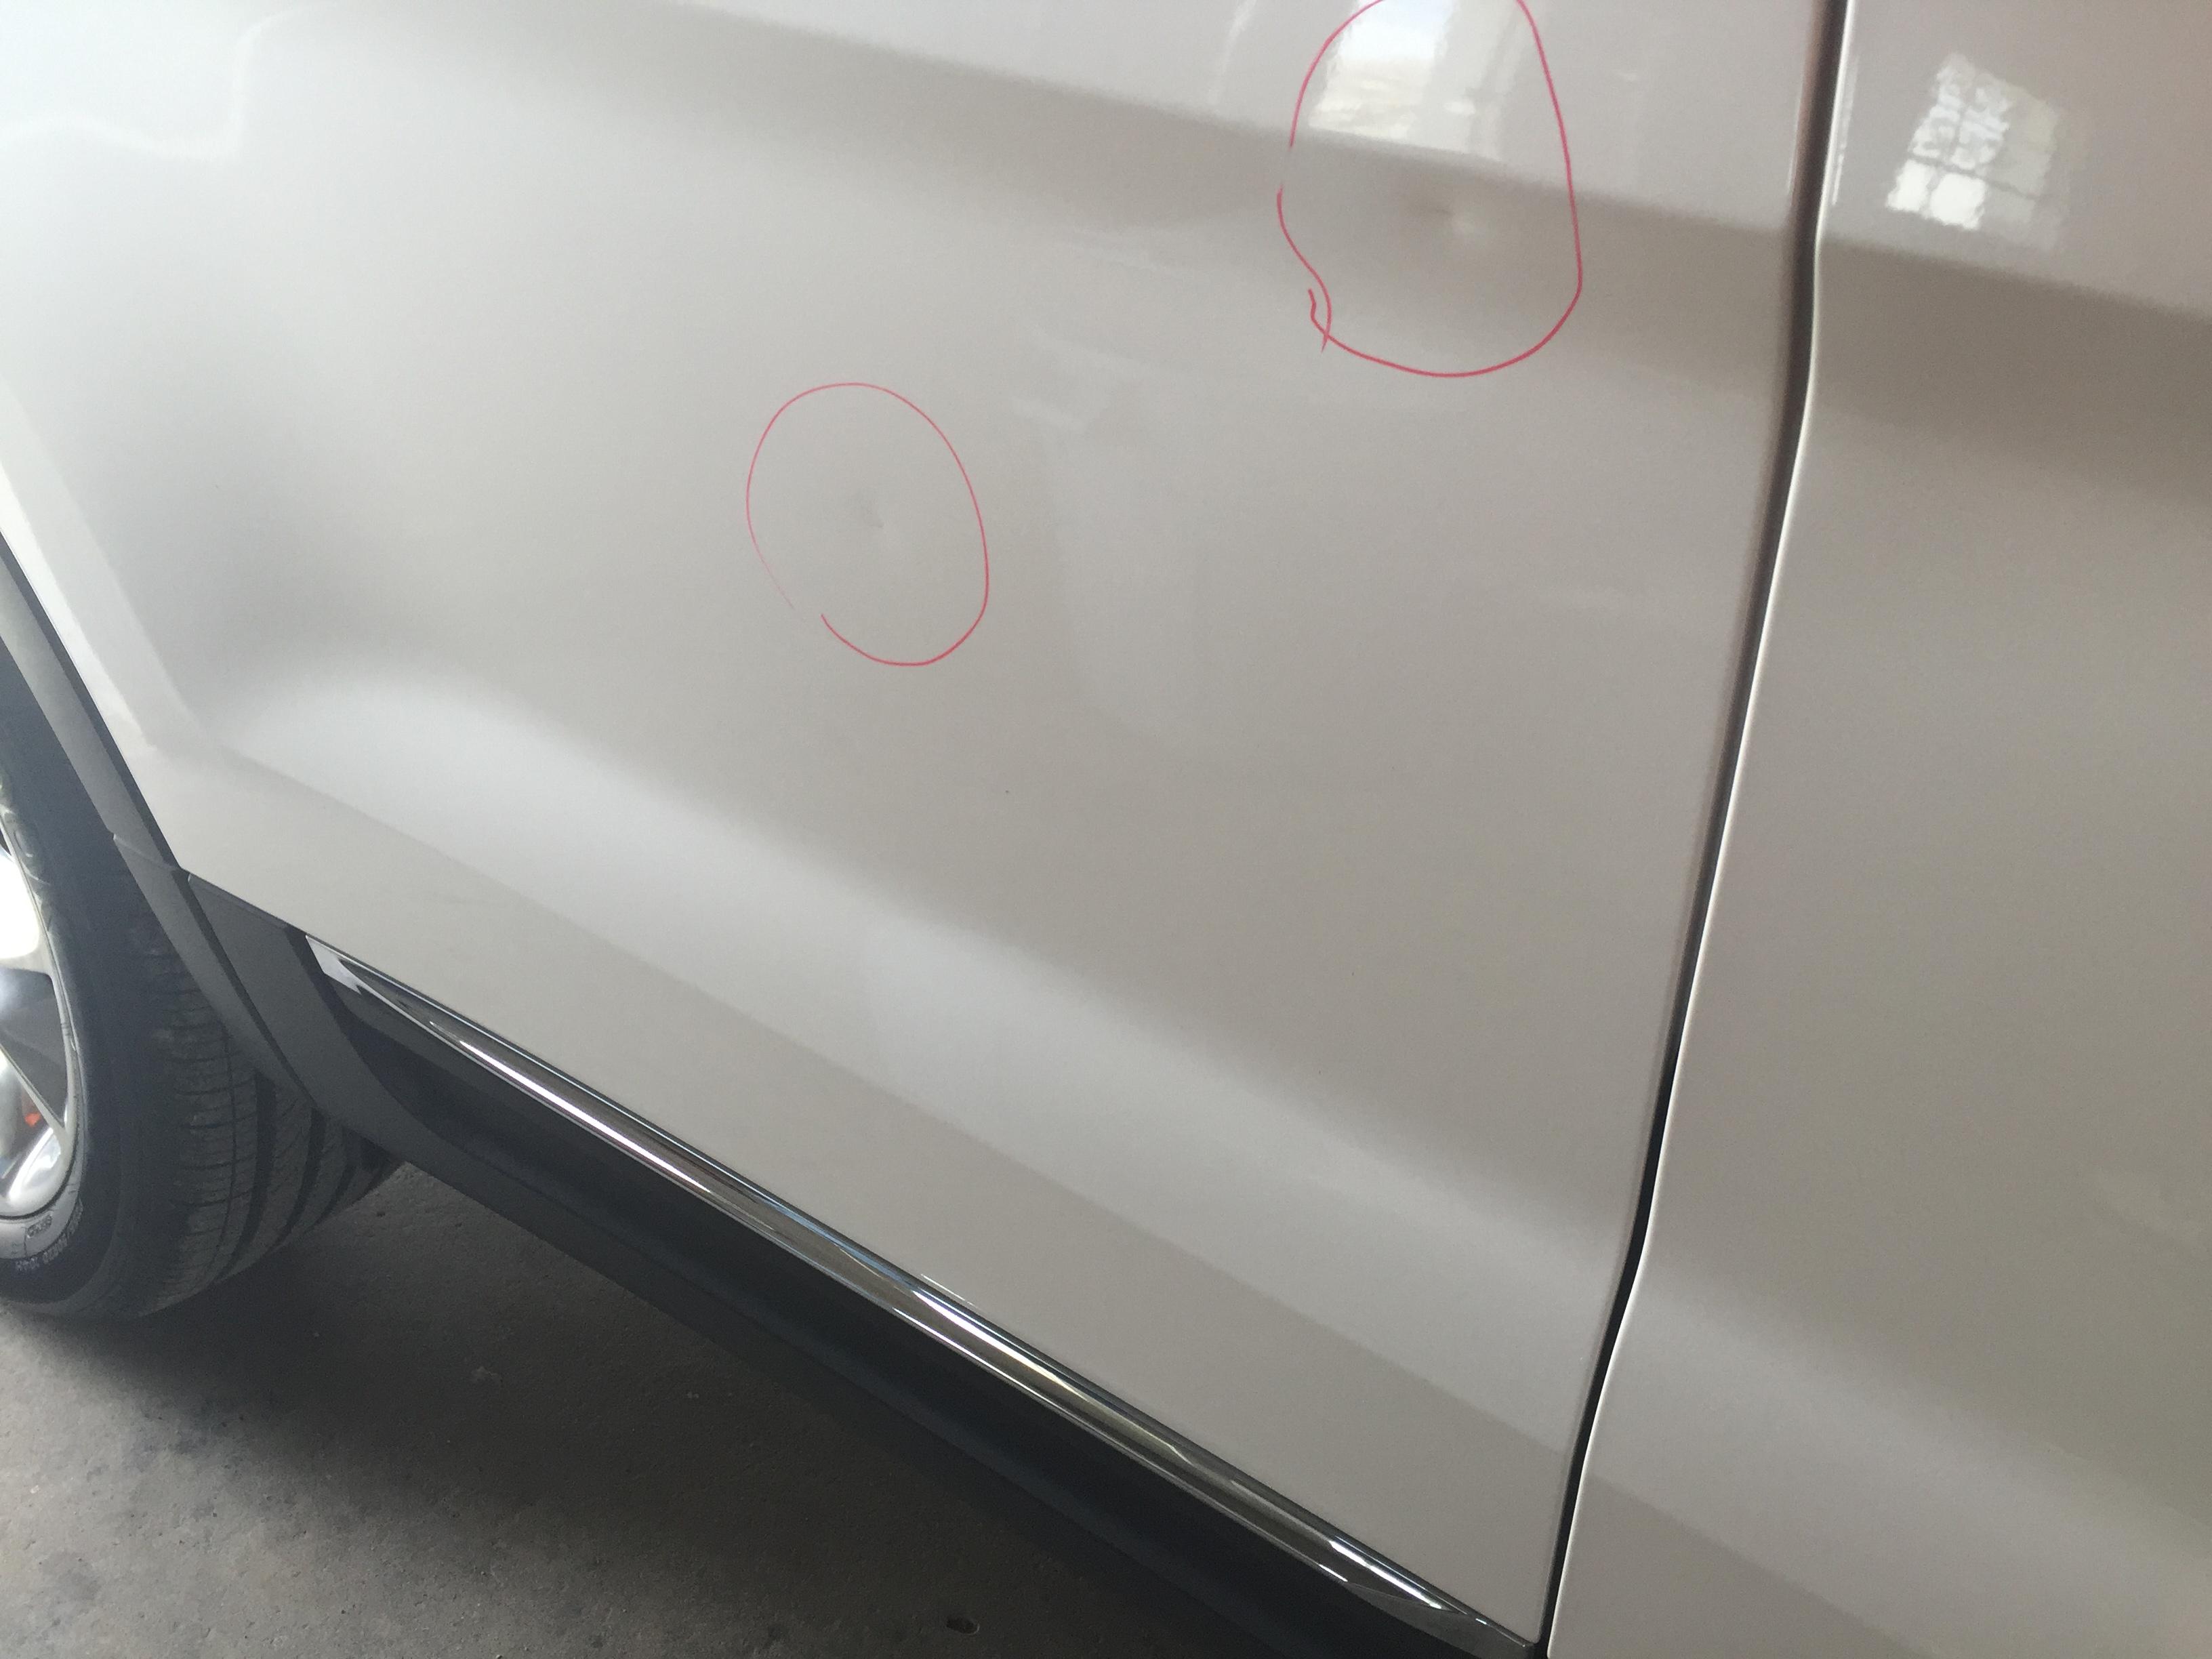 2014 Ford Explorer XLT Tri Coat White, Paintless Dent Repair Springfield IL, Pana IL Taylorville IL